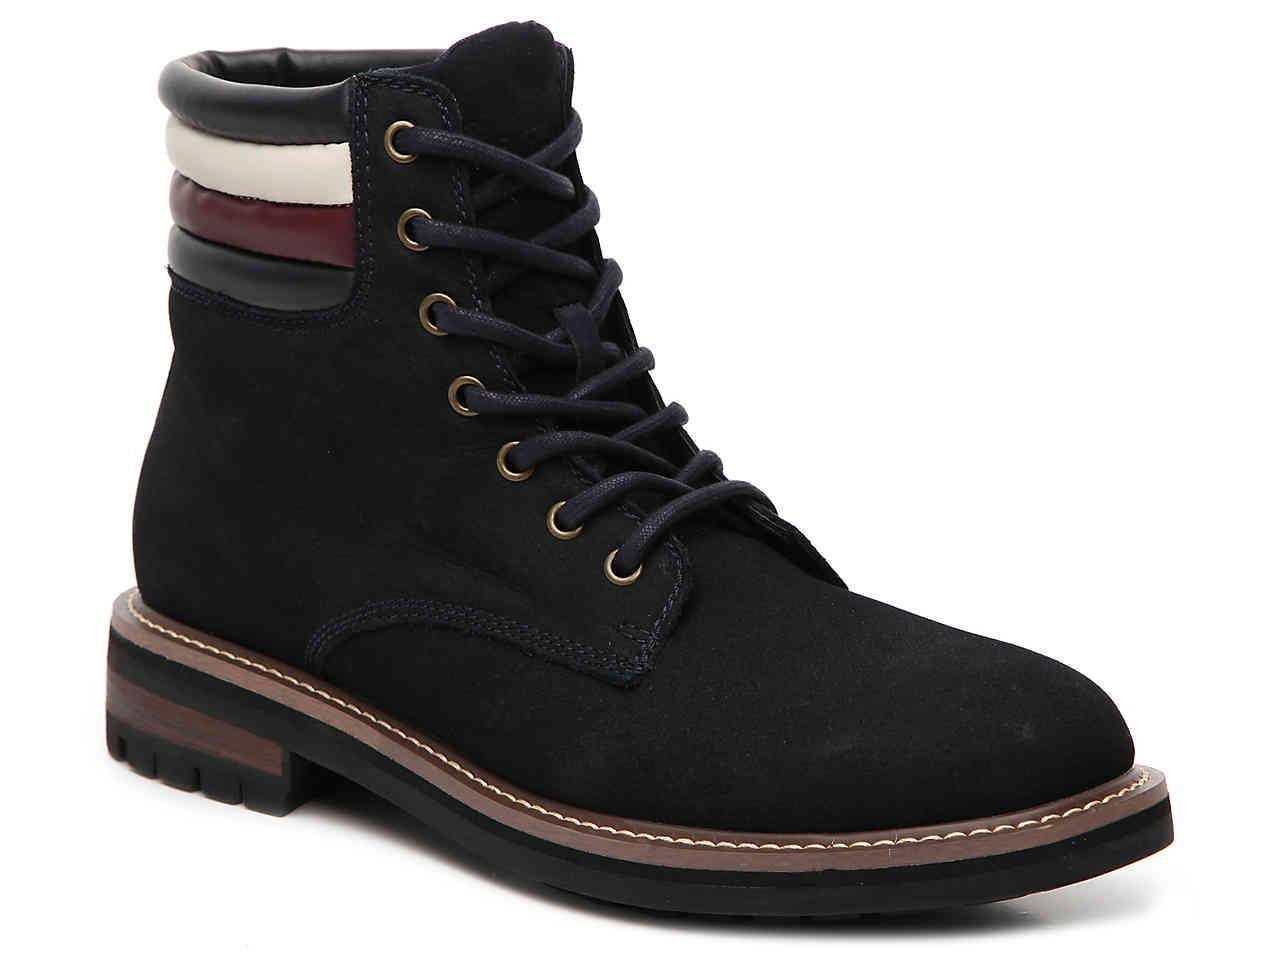 4aecc0719 Мужские ботинки Tommy Hilfiger (Томми Хилфигер). Оригинал: продажа ...